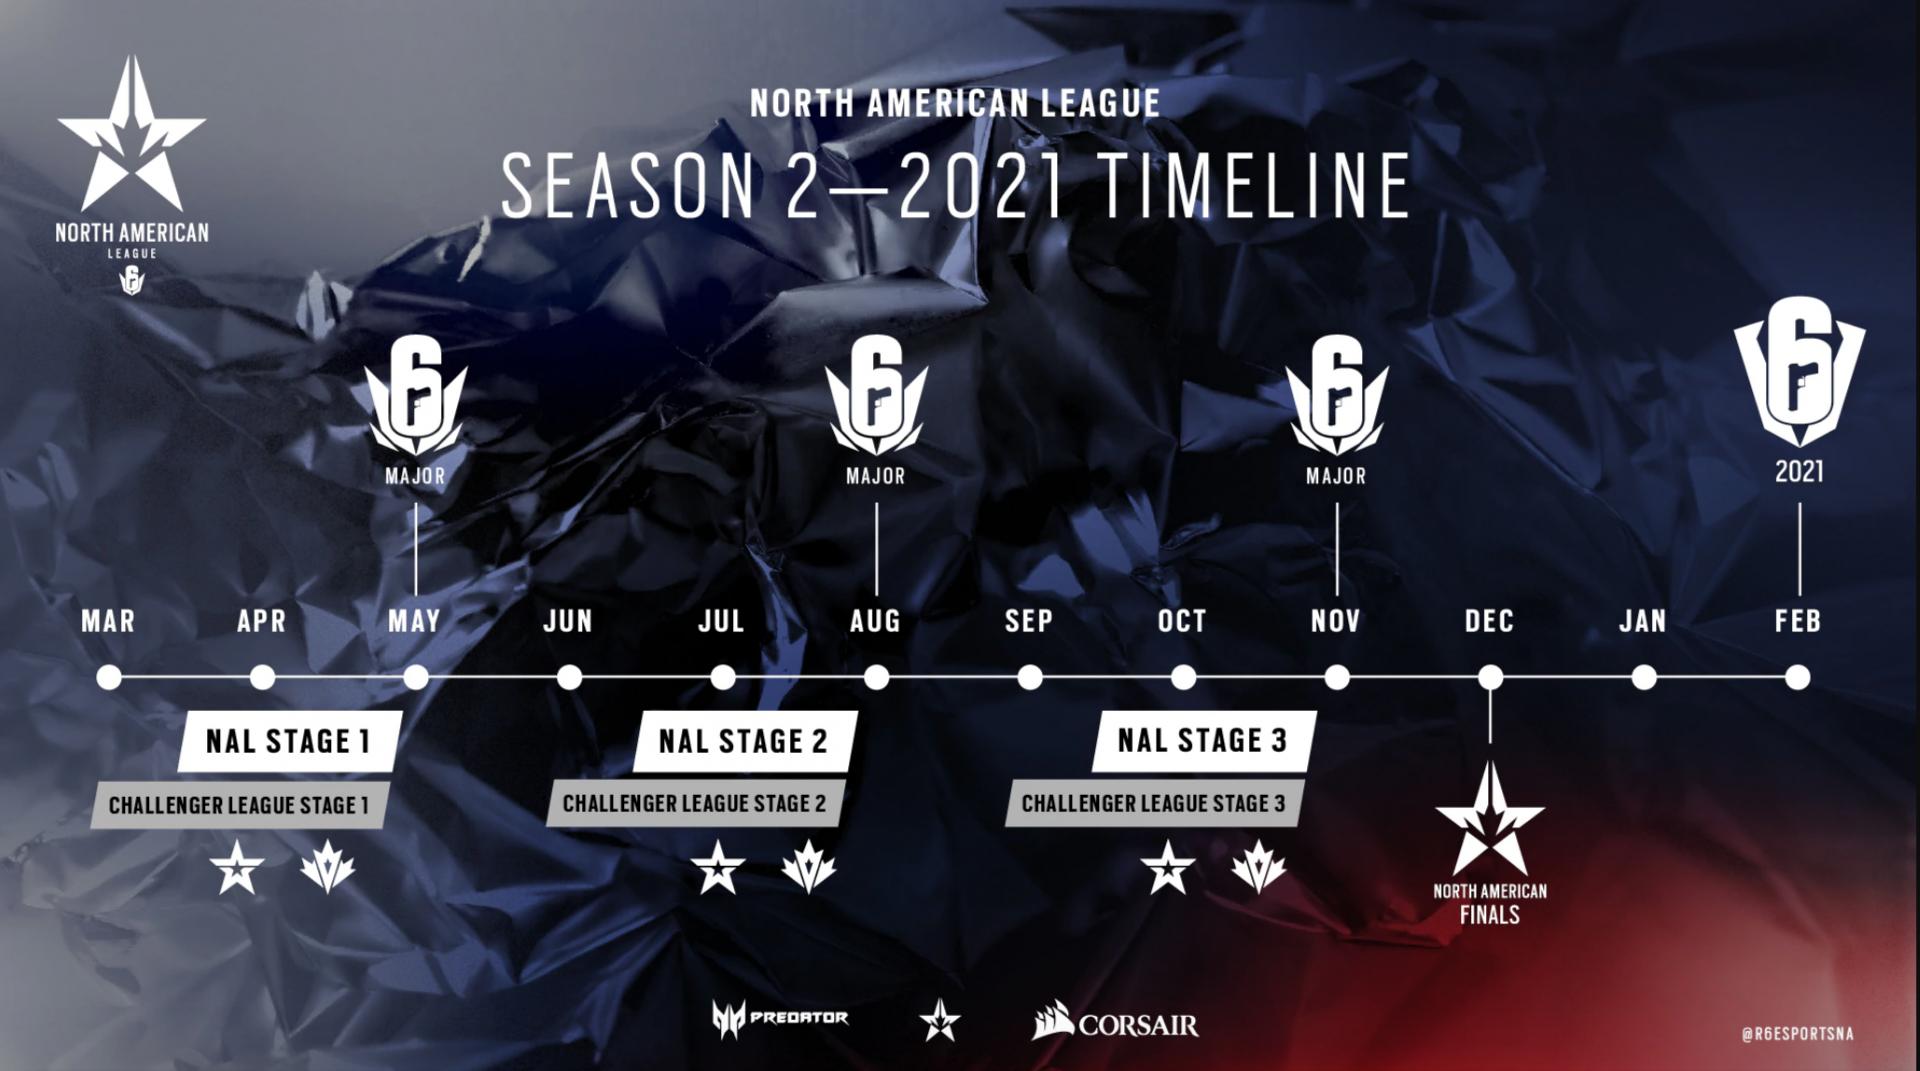 Rainbow Six North American League timeline